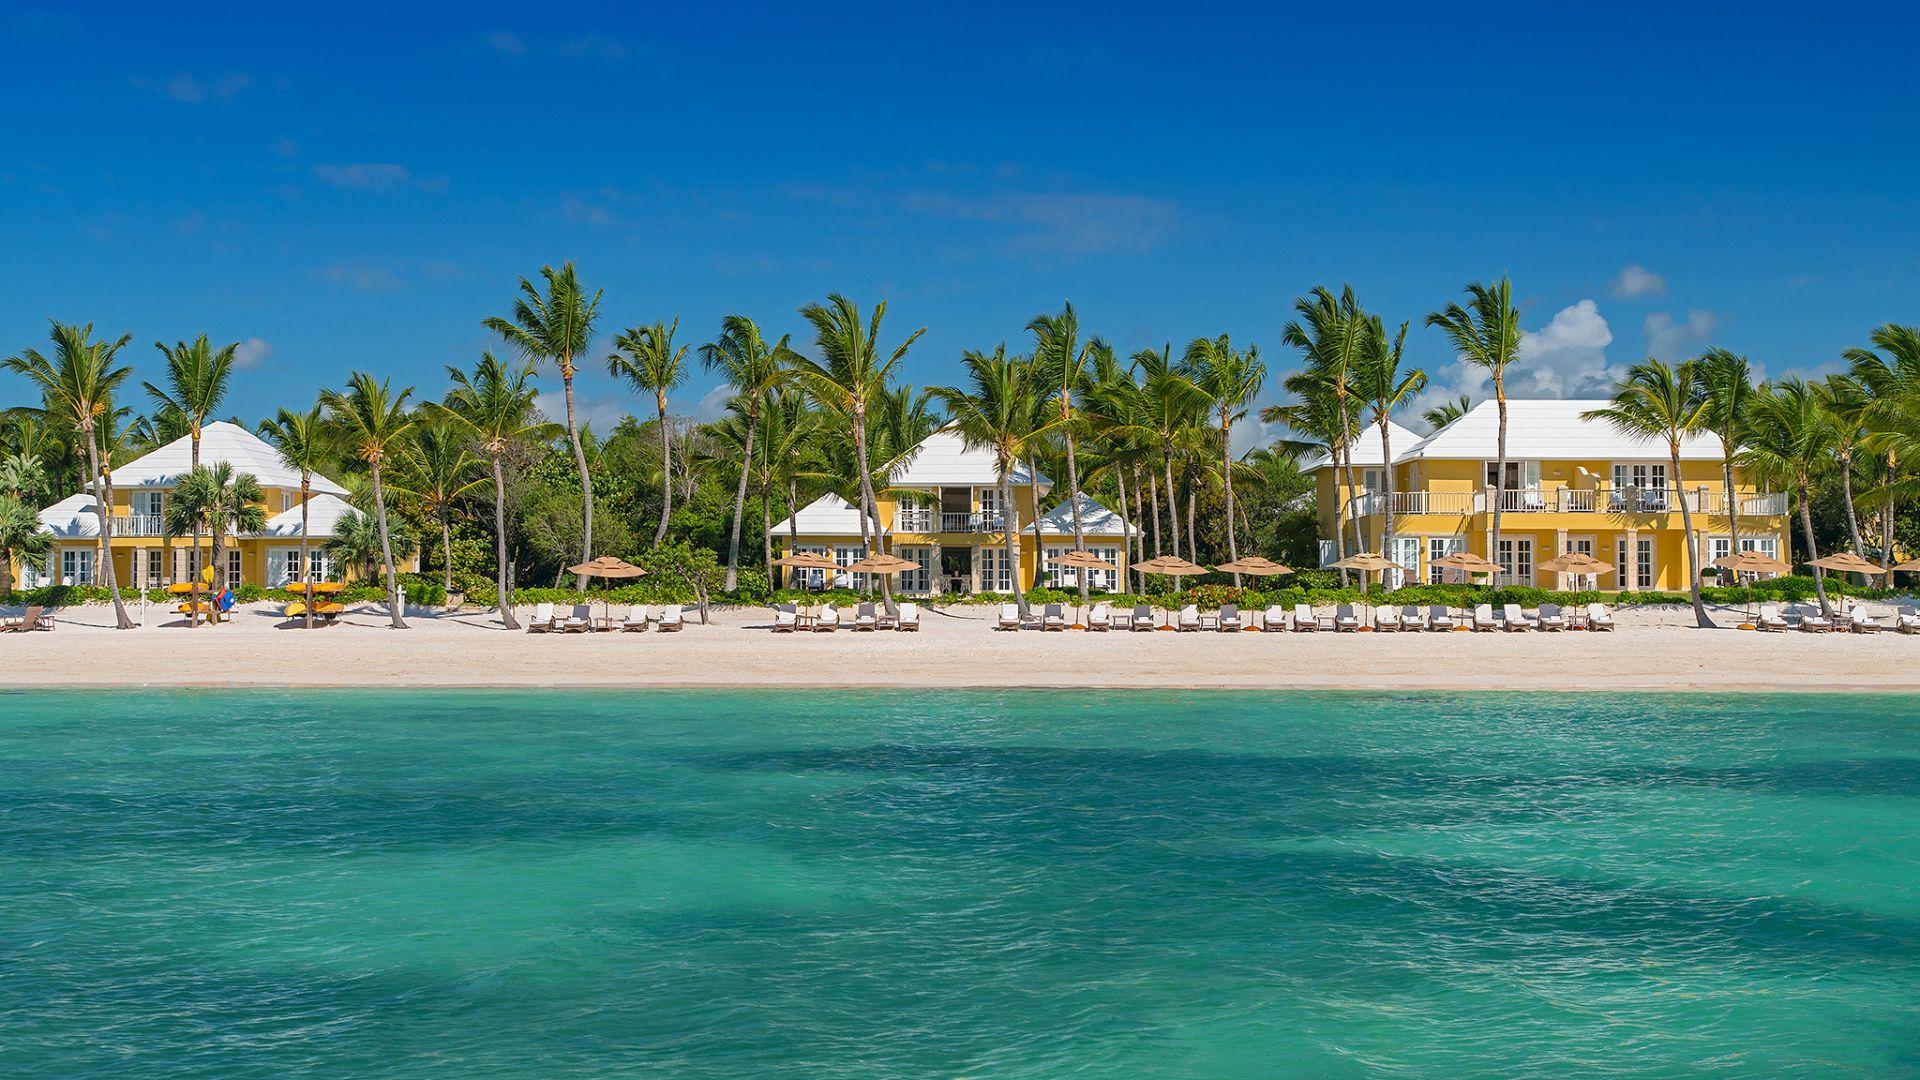 Dominican Republic Resorts >> Luxury Dominican Resorts Best Hotels In Dominican Republic Kiwi